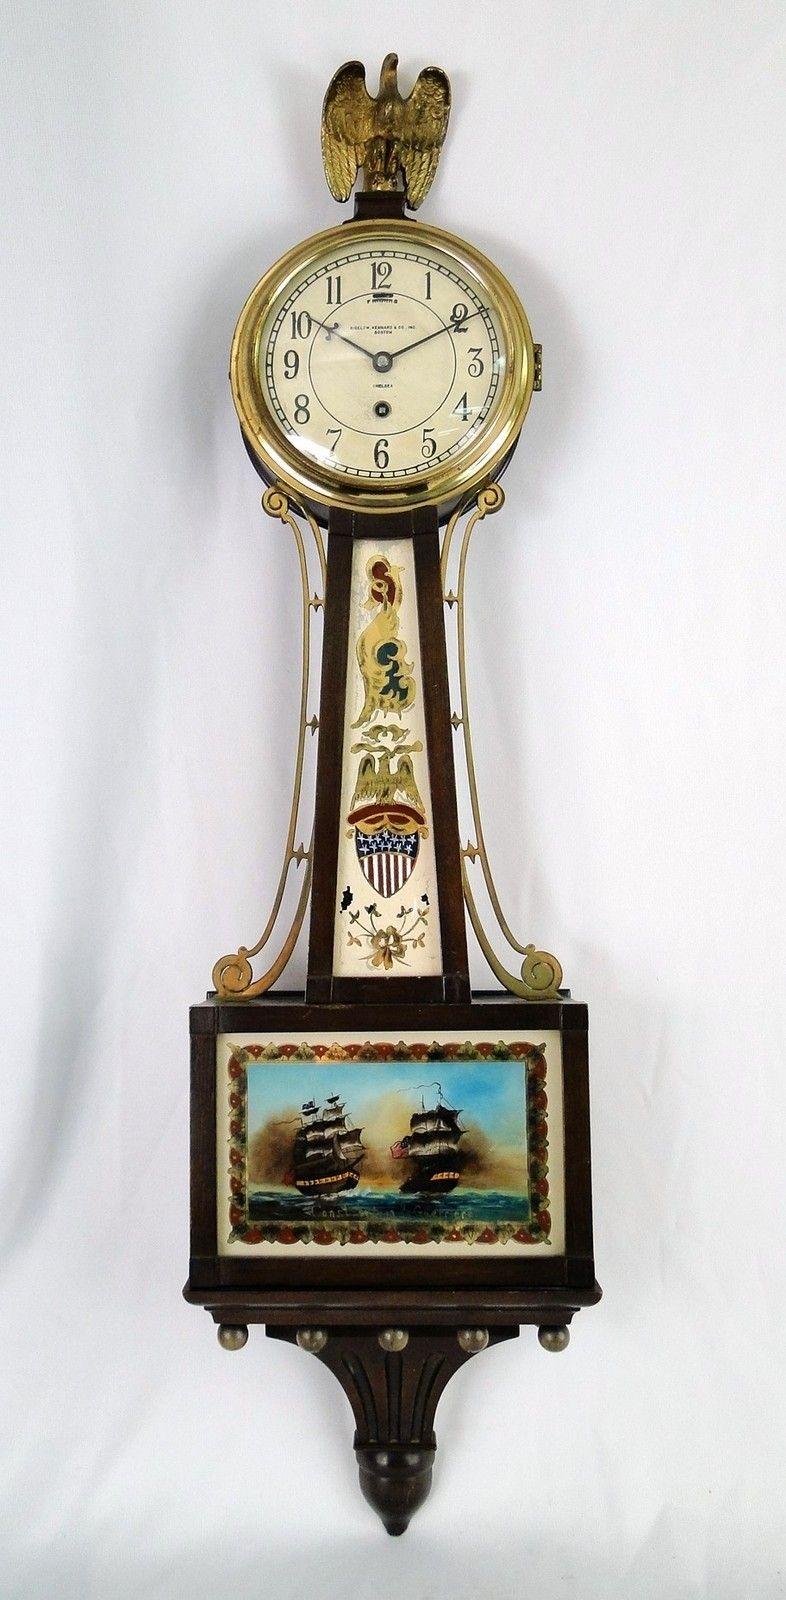 Antique 20c Chelsea Mahogany Case Constitution Guerriere Banjo Wall Clock Ebay Antique Wall Clocks Wall Clock Clock